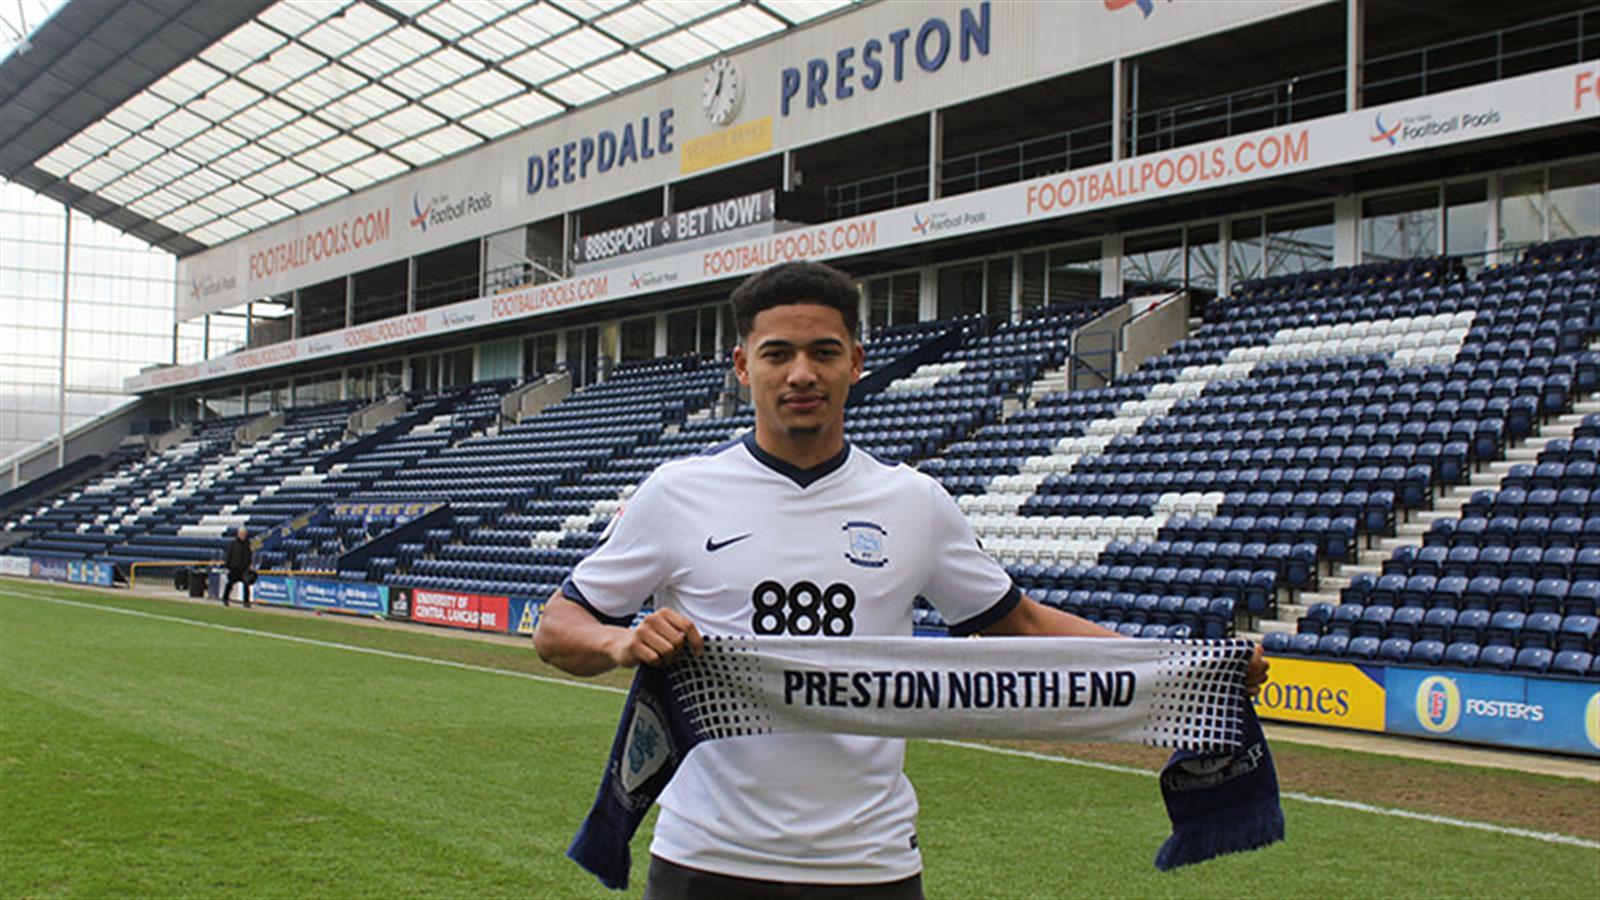 Season Ticket Loan >> Everton's Tyias Browning Joins On Loan - News - Preston North End